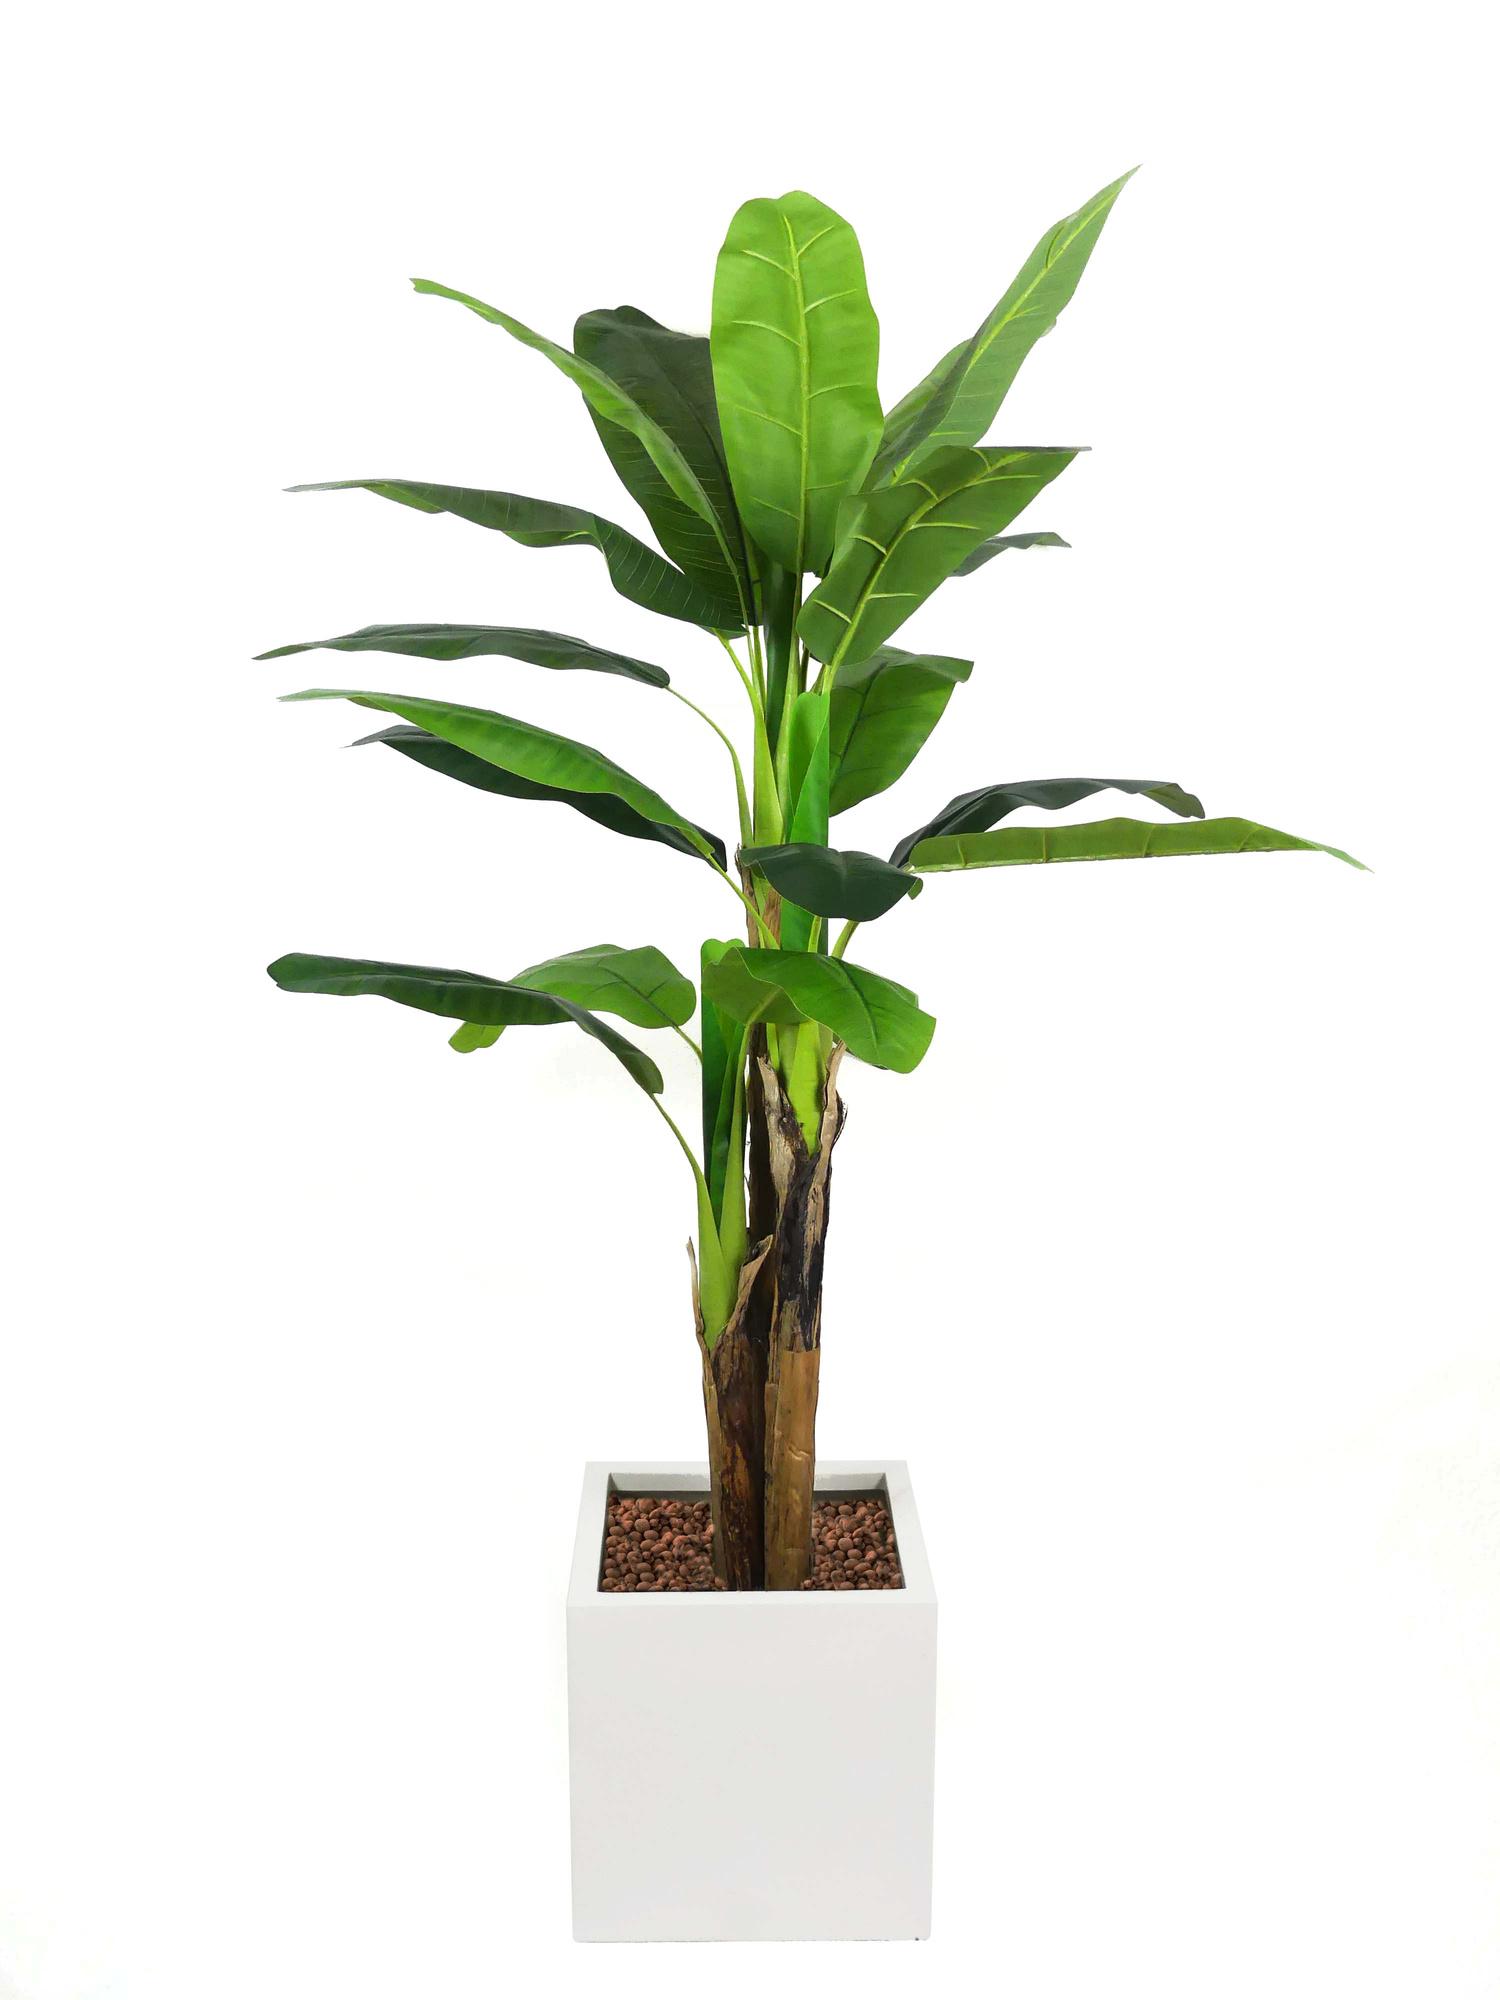 Banano - NEW! | Piante Artificiali da Interno | Viridium